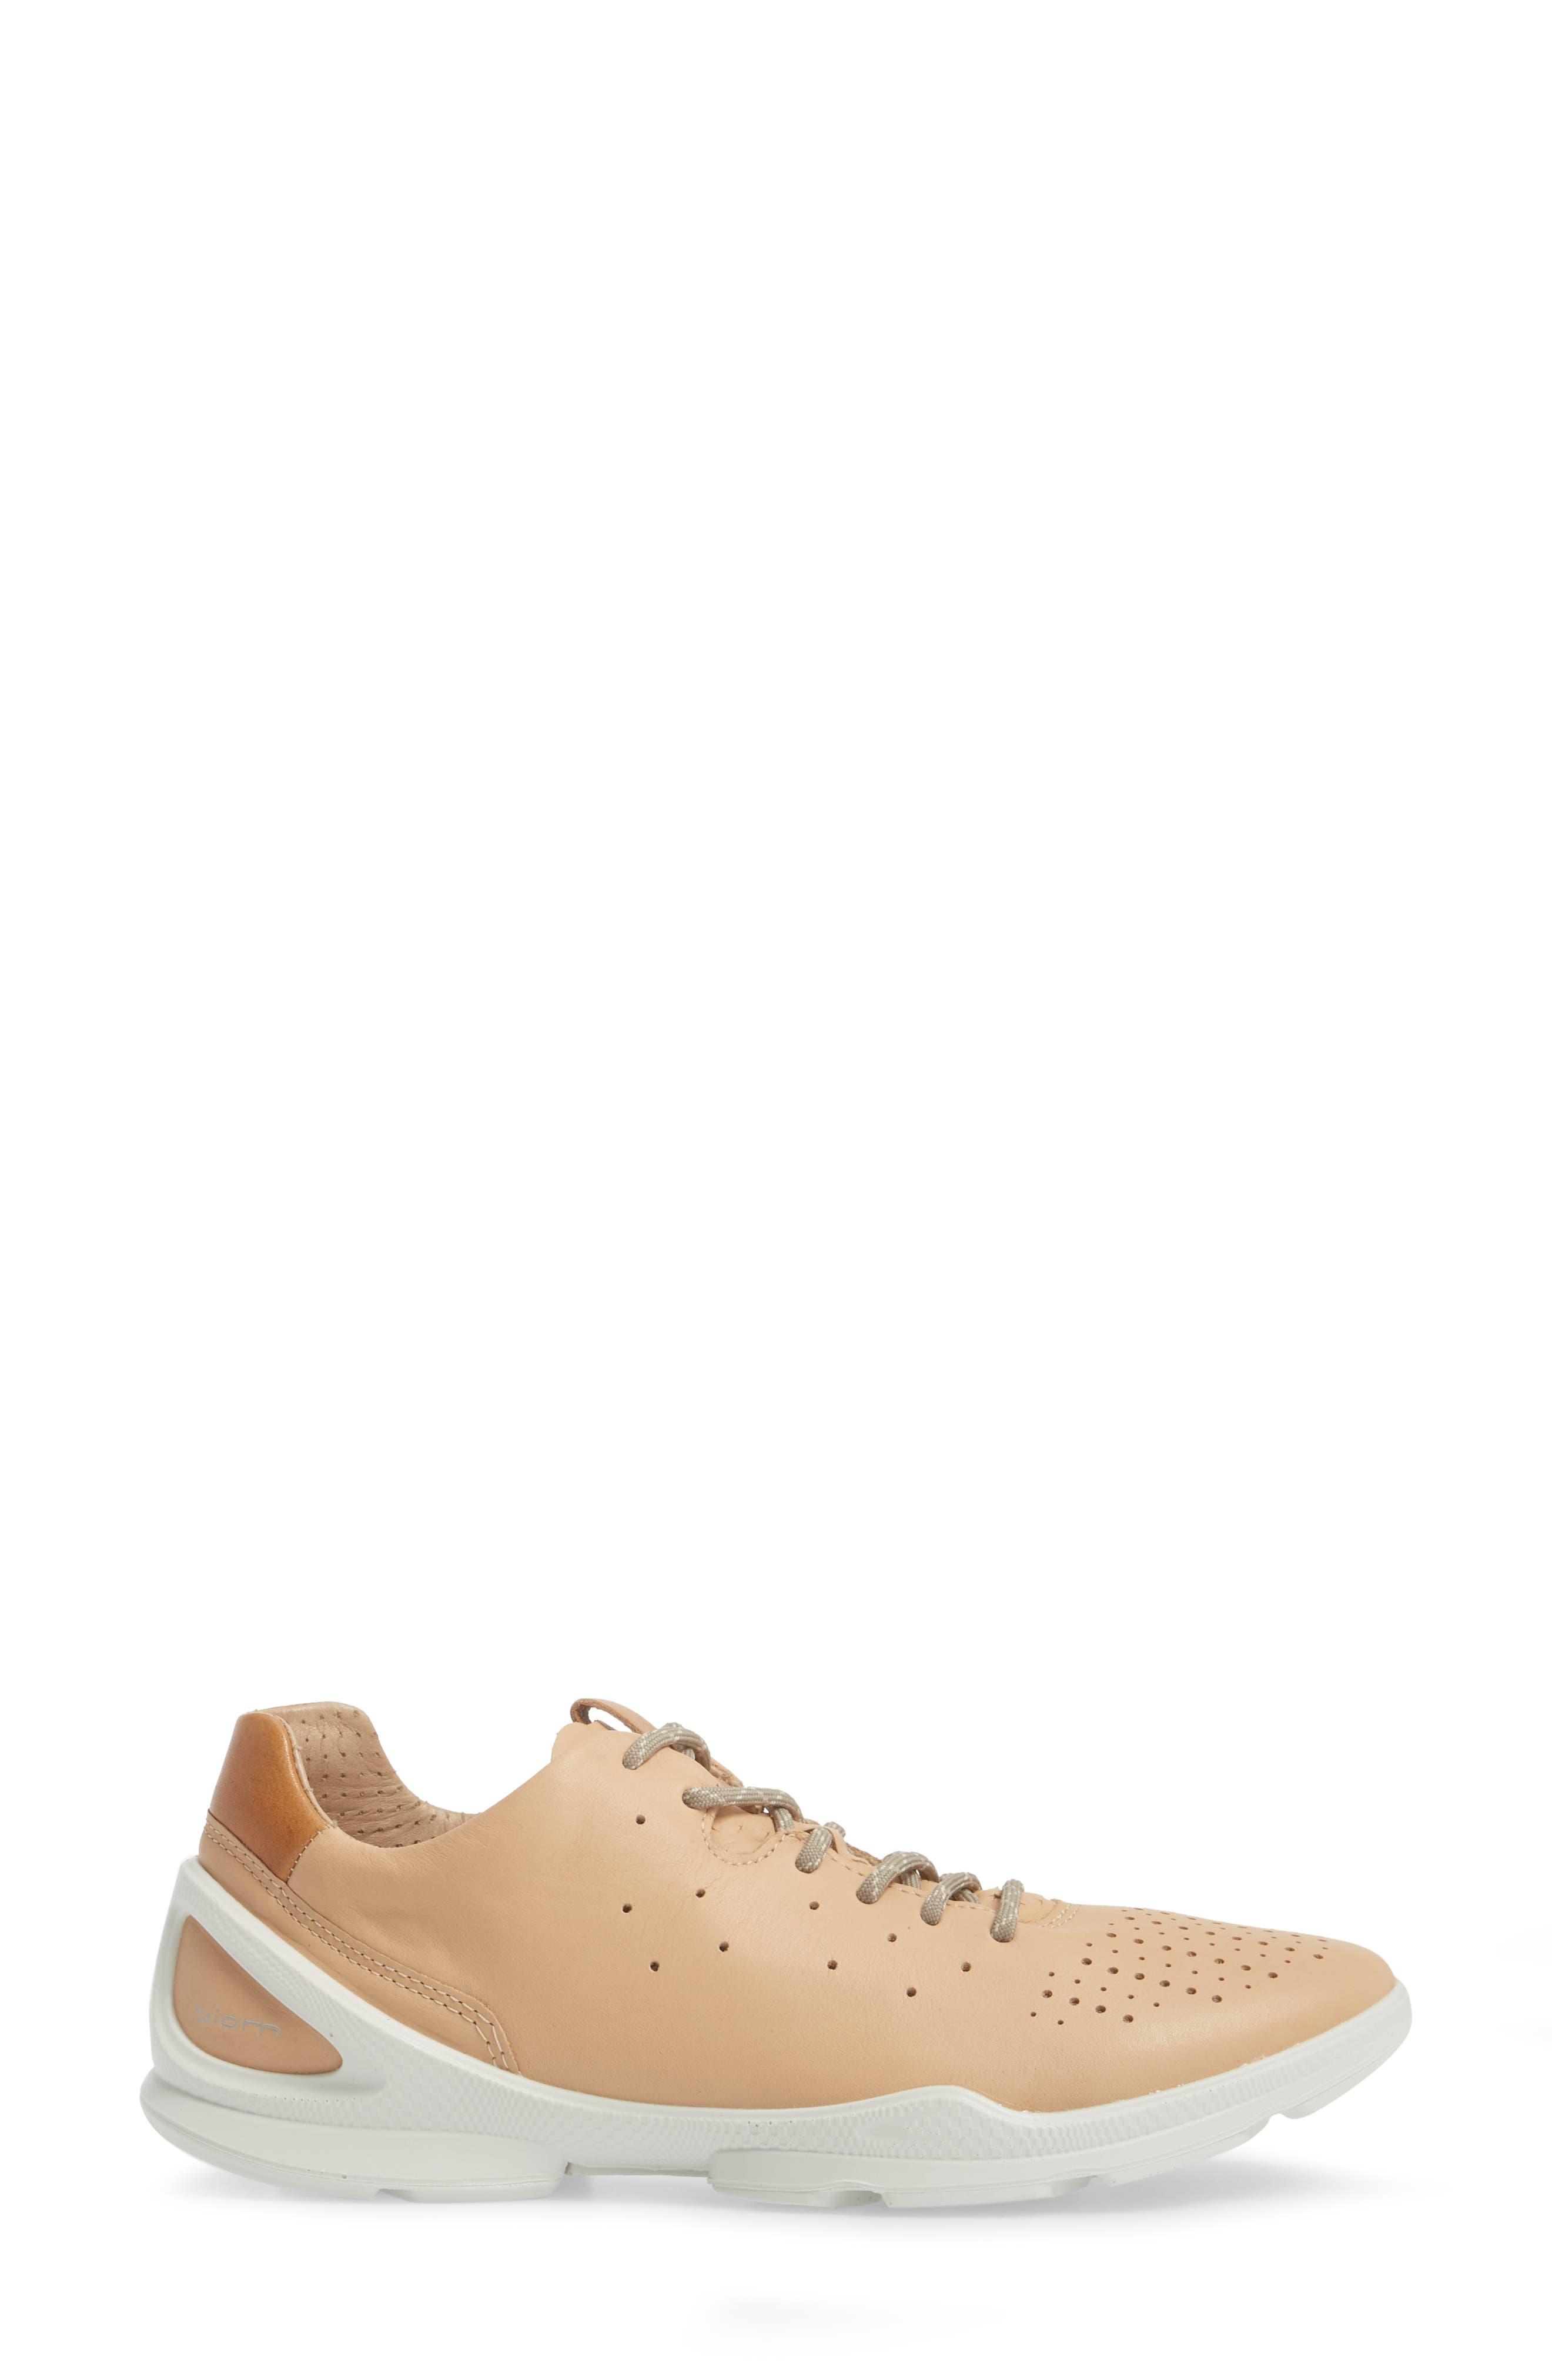 Biom Street Sneaker,                             Alternate thumbnail 3, color,                             Powder Leather